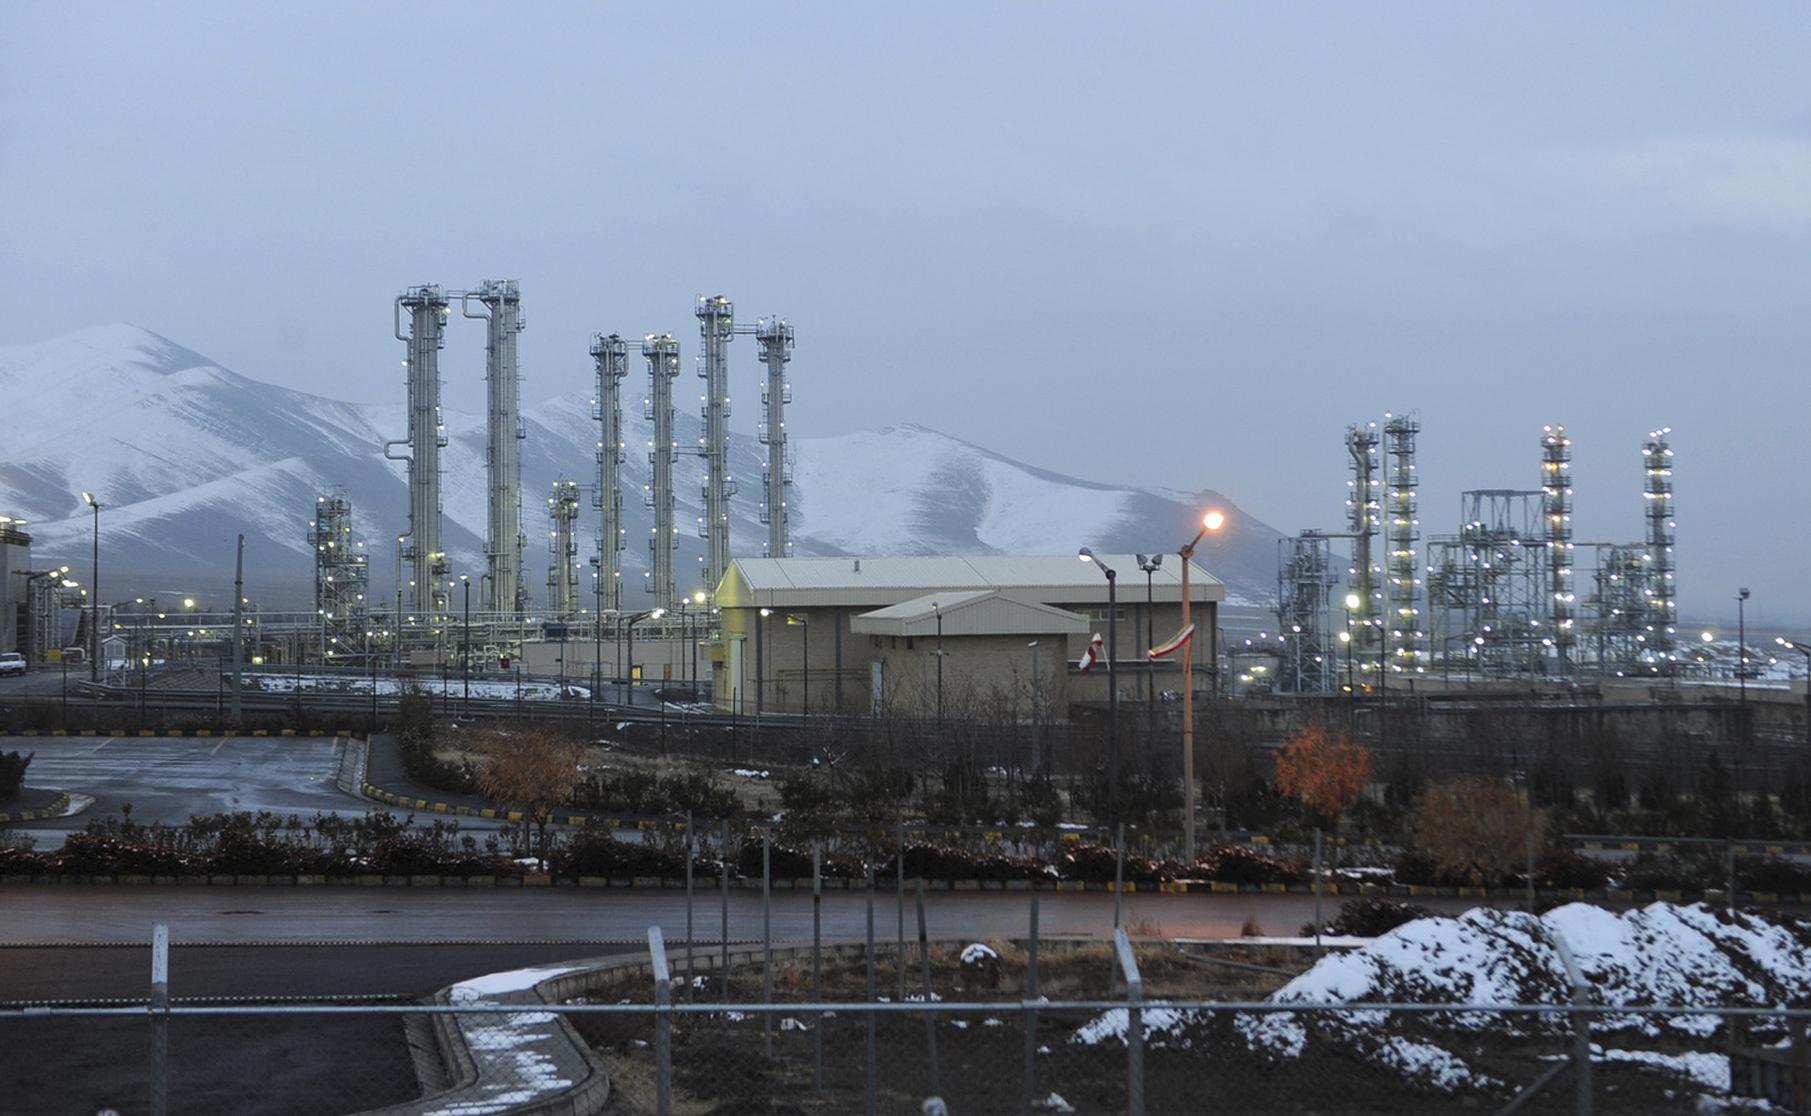 This Jan. 15, 2011 file photo shows Arak heavy water nuclear facilities, near the central city of Arak, 150 miles (250 kilometers) southwest of the capital Tehran, Iran. (AP Photo/ISNA, Hamid Foroutan, File)